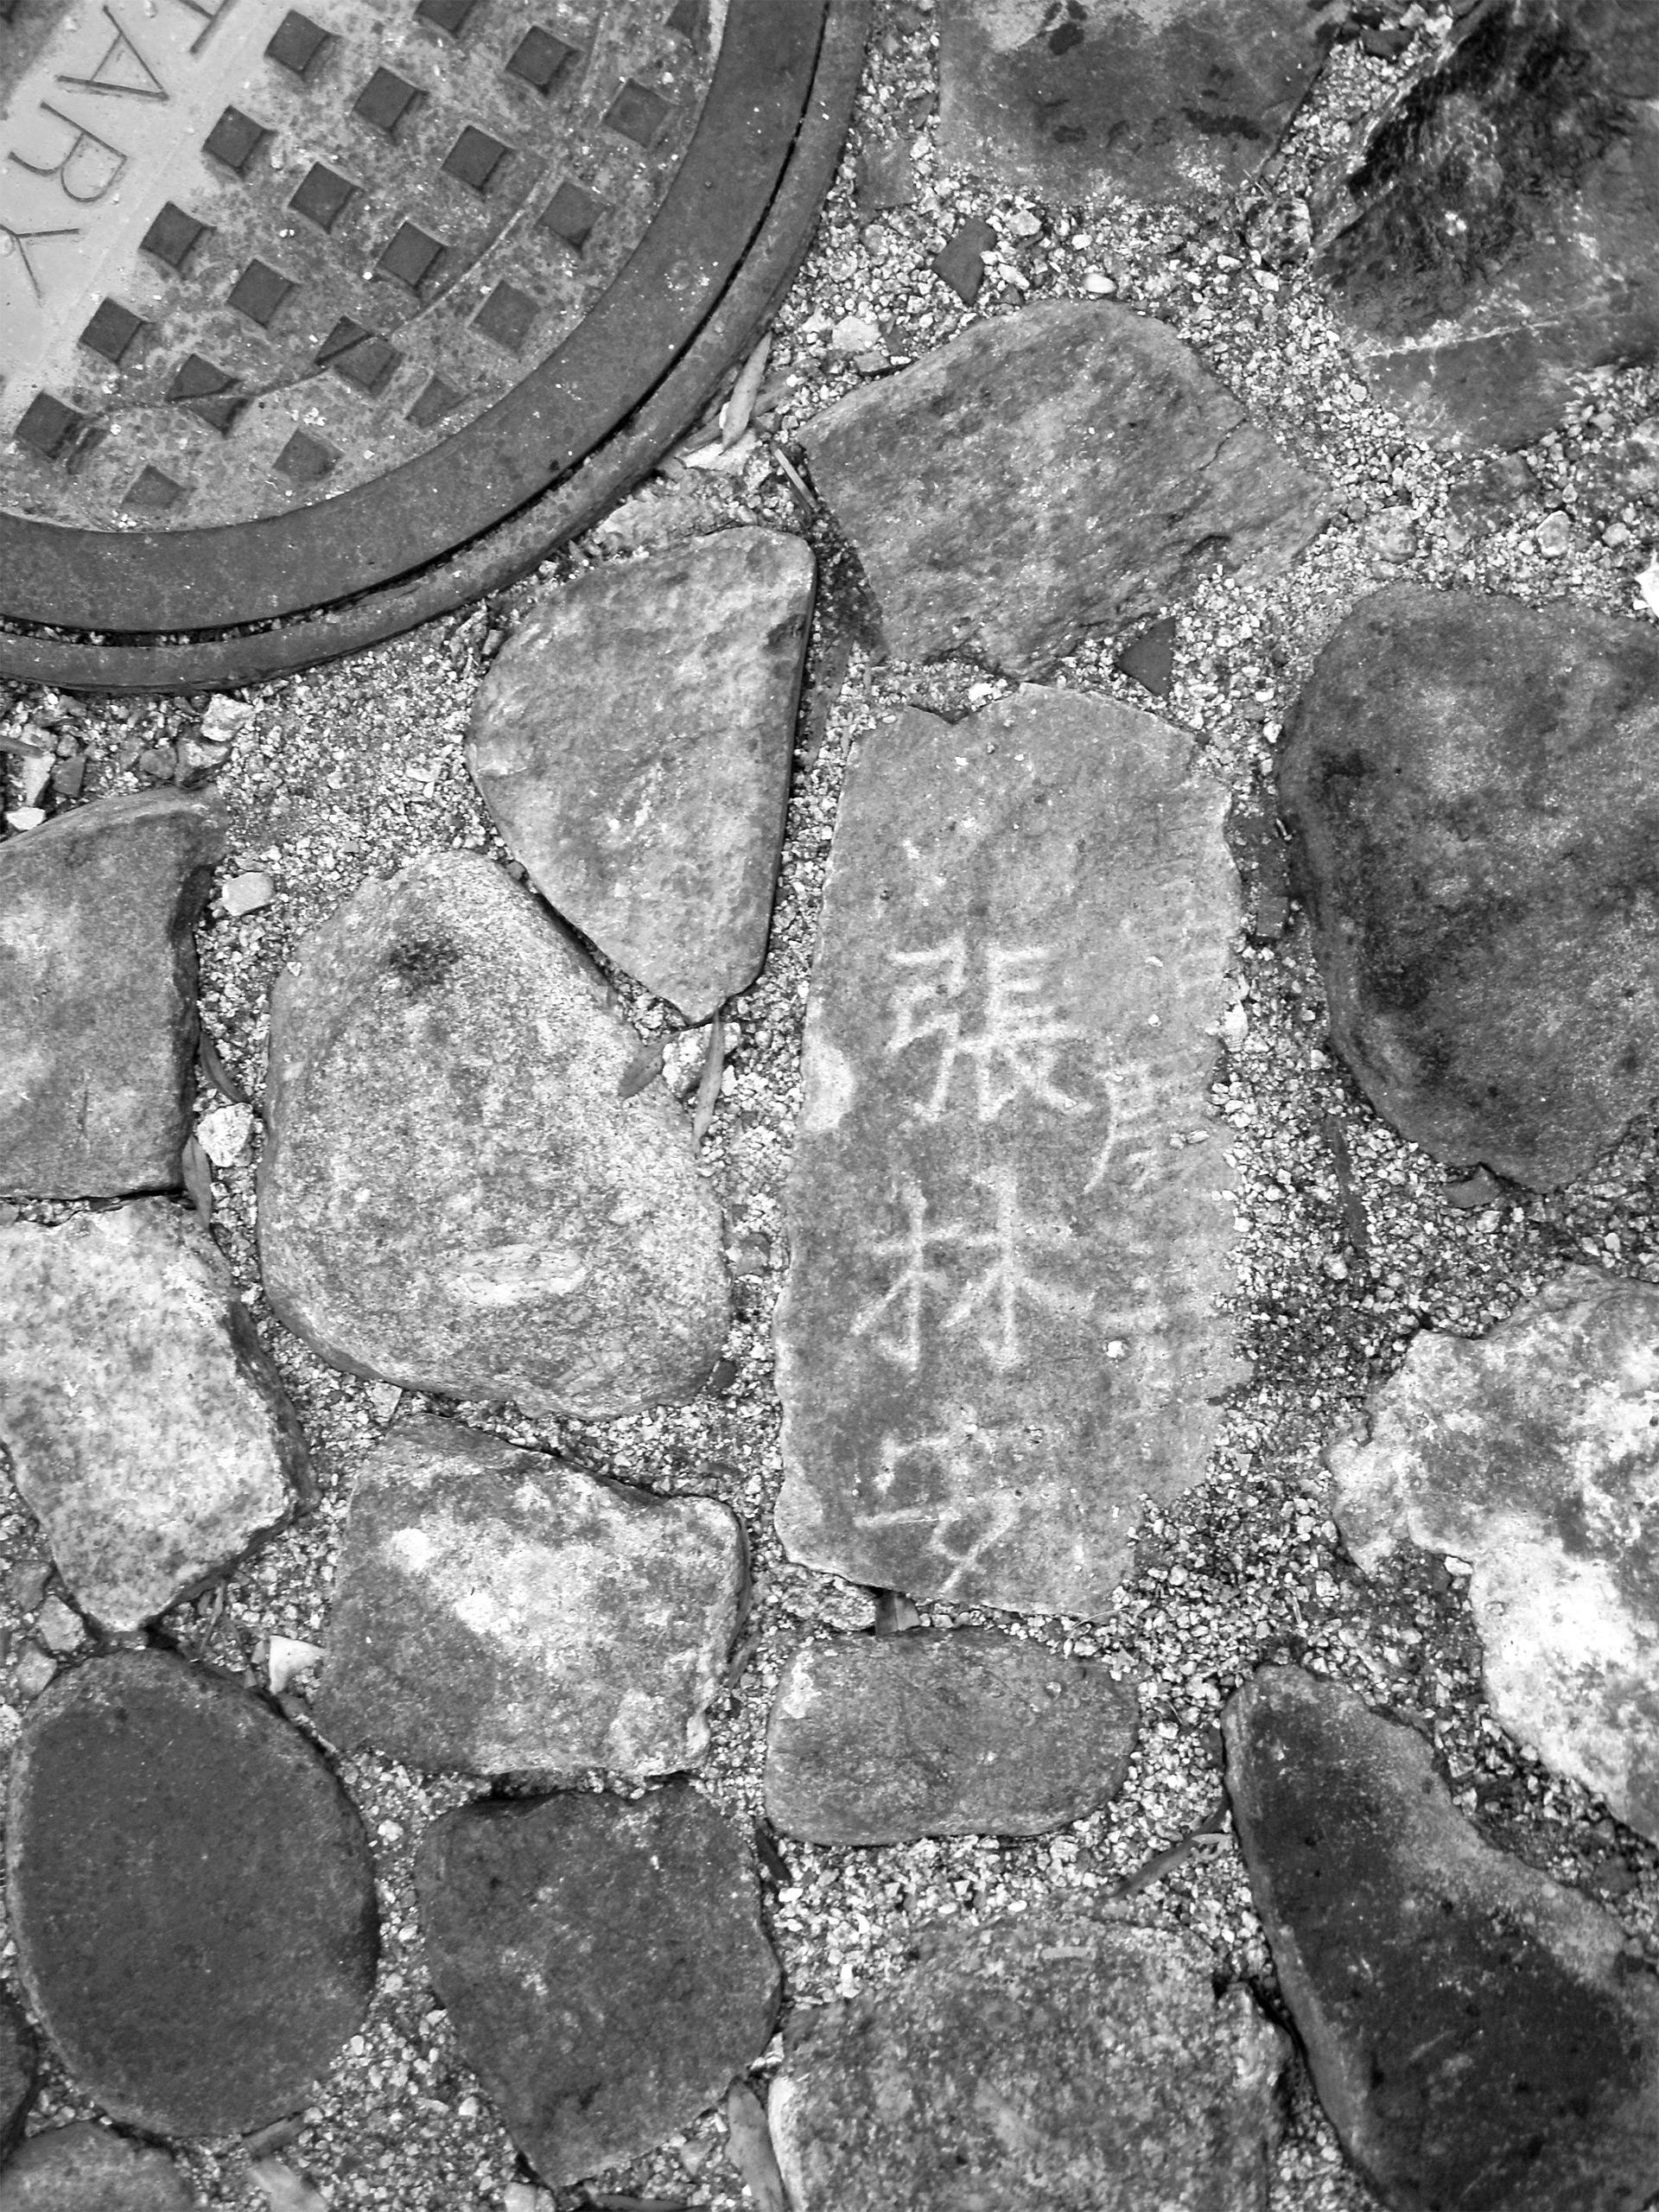 Chinese cobblestone, architectural history